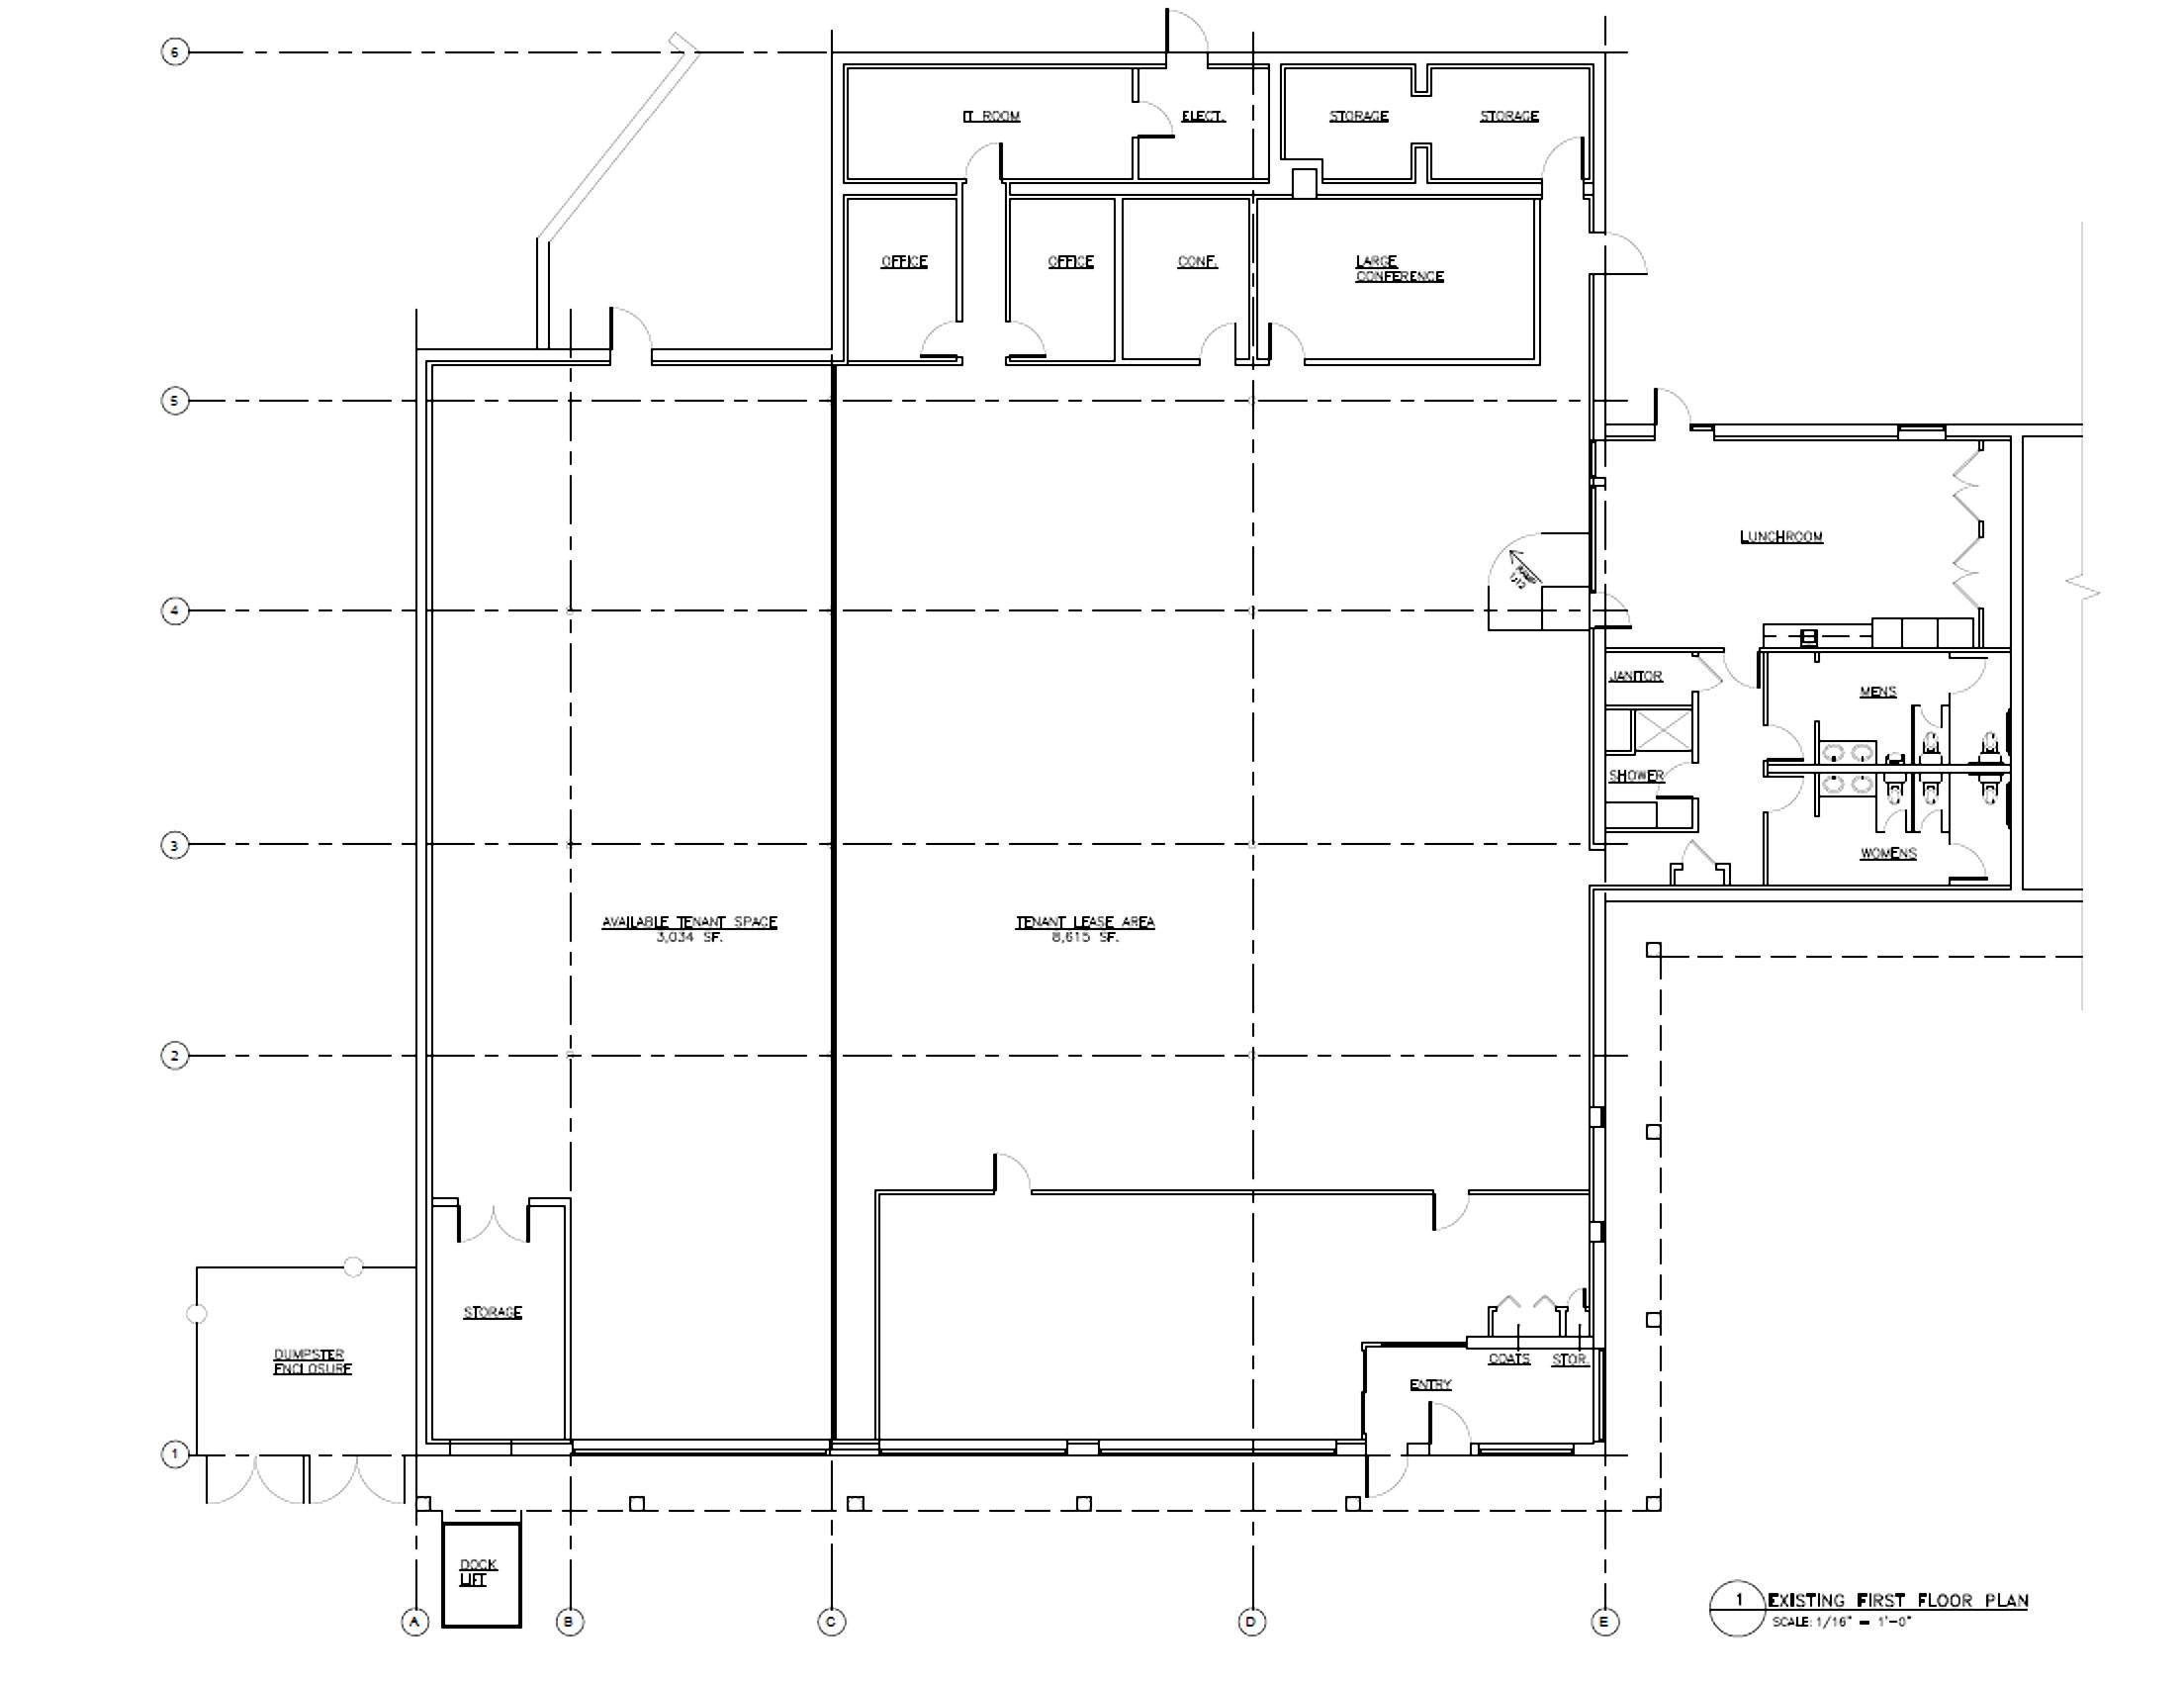 770 Main St, Osterville Building Plan